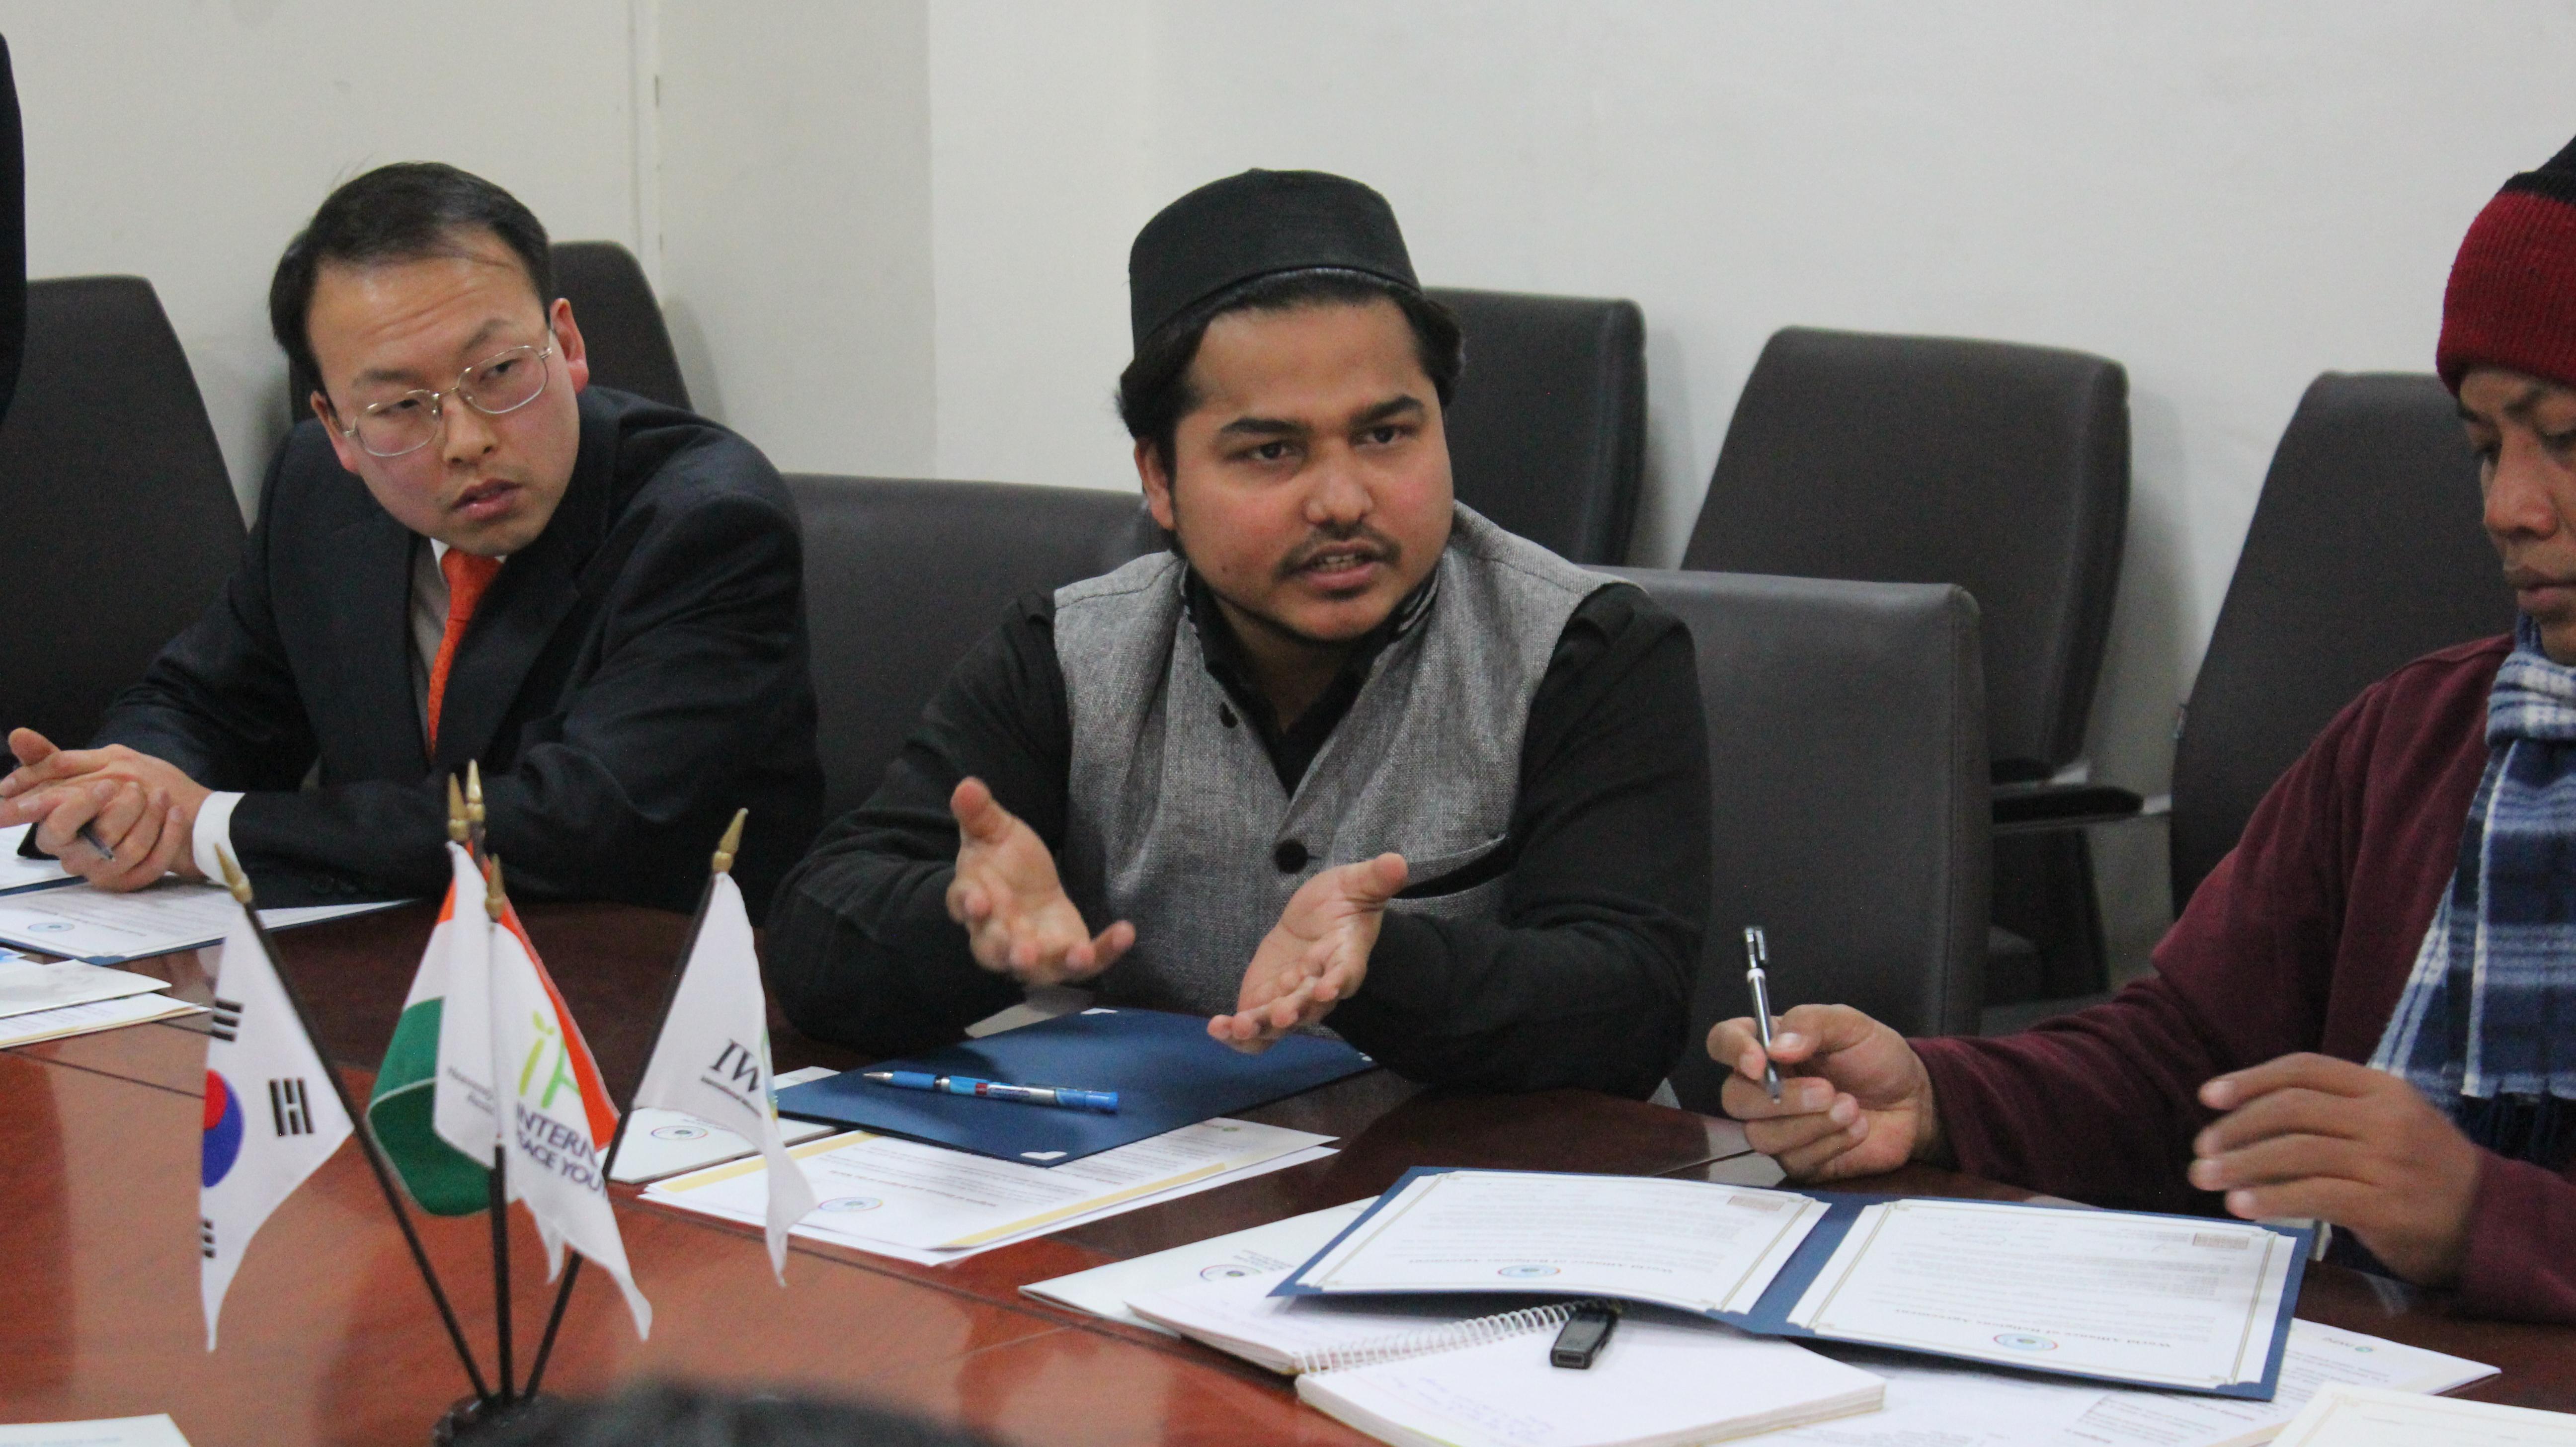 HWPL WARP Office_India.JPG